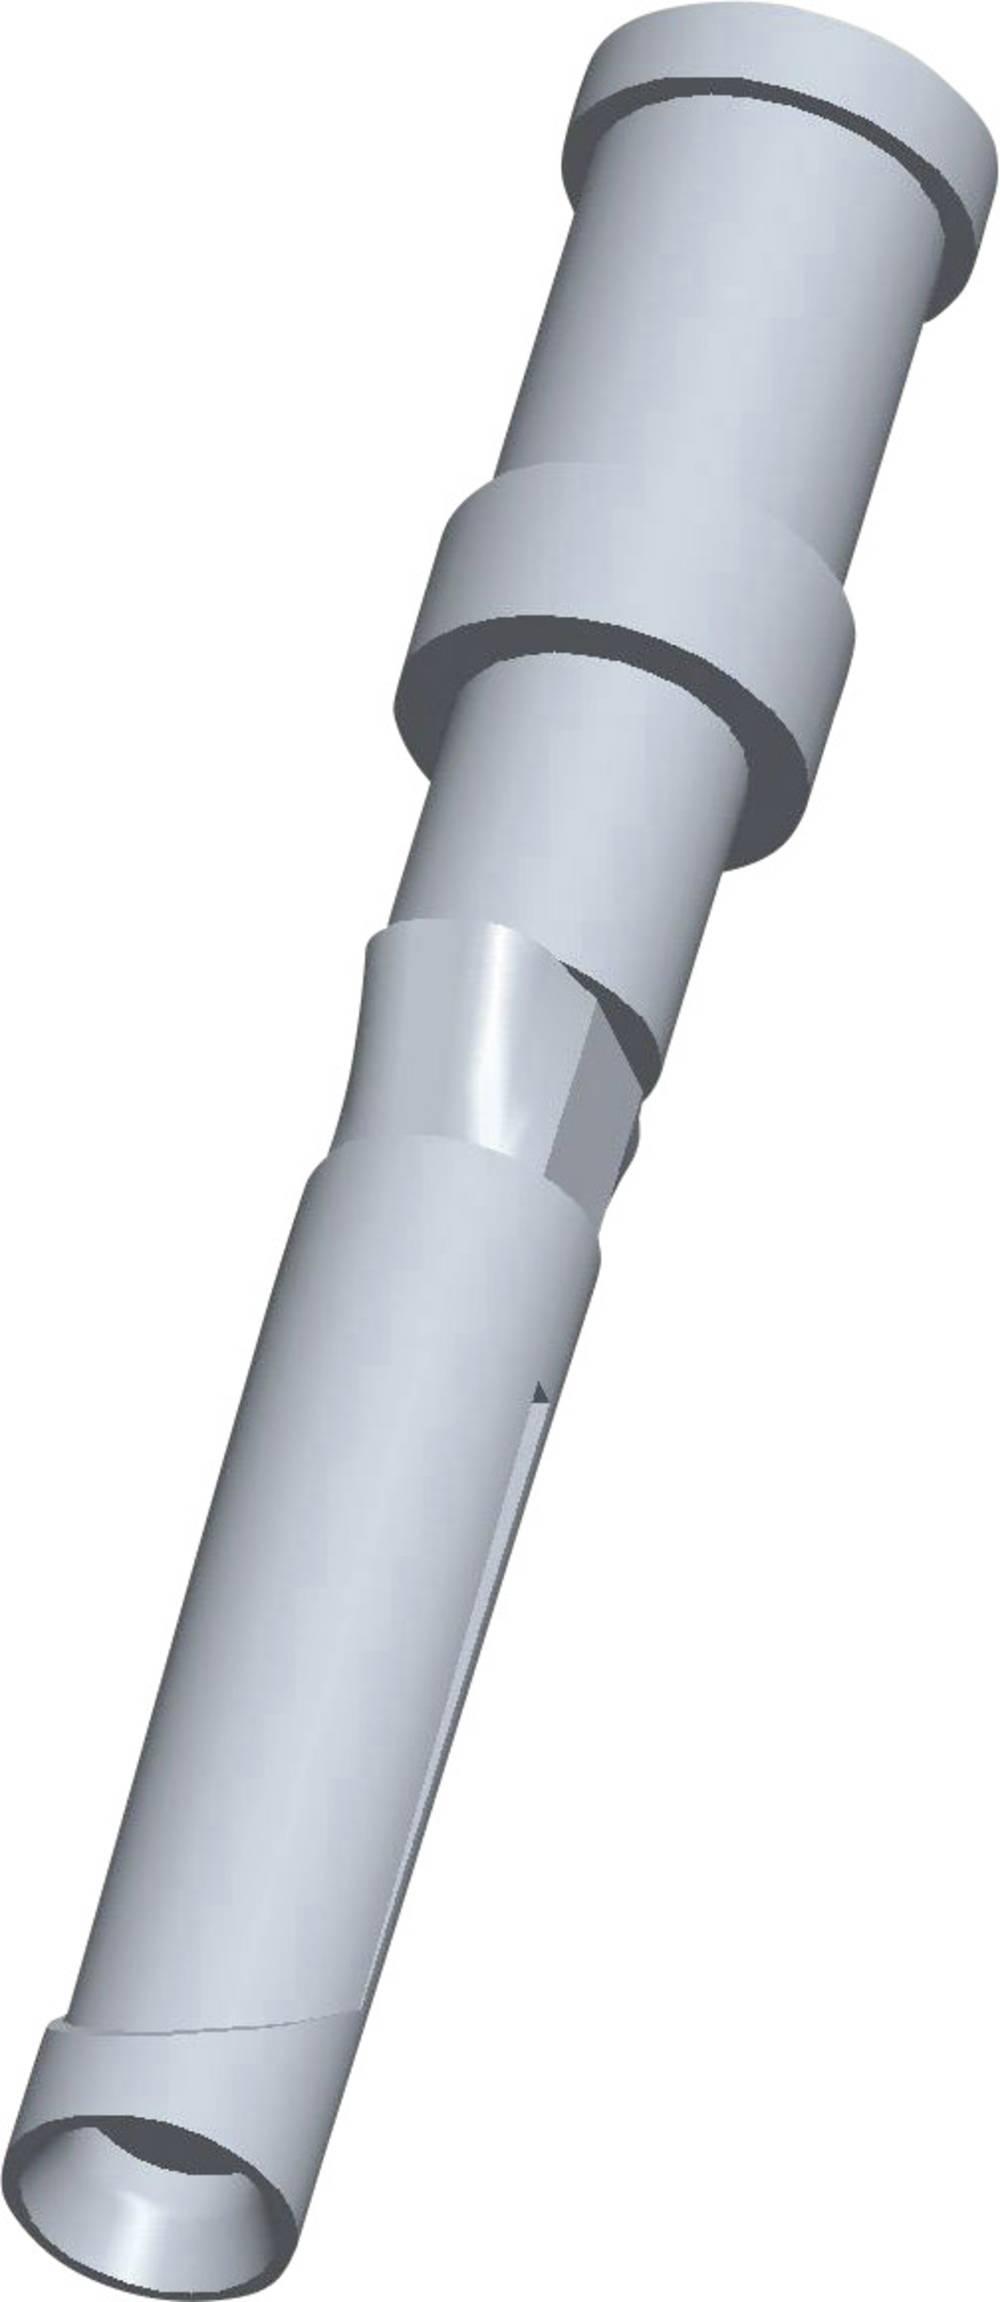 Socket kontakt HN TE Connectivity HN.D C BU.AU.0,75 1 stk